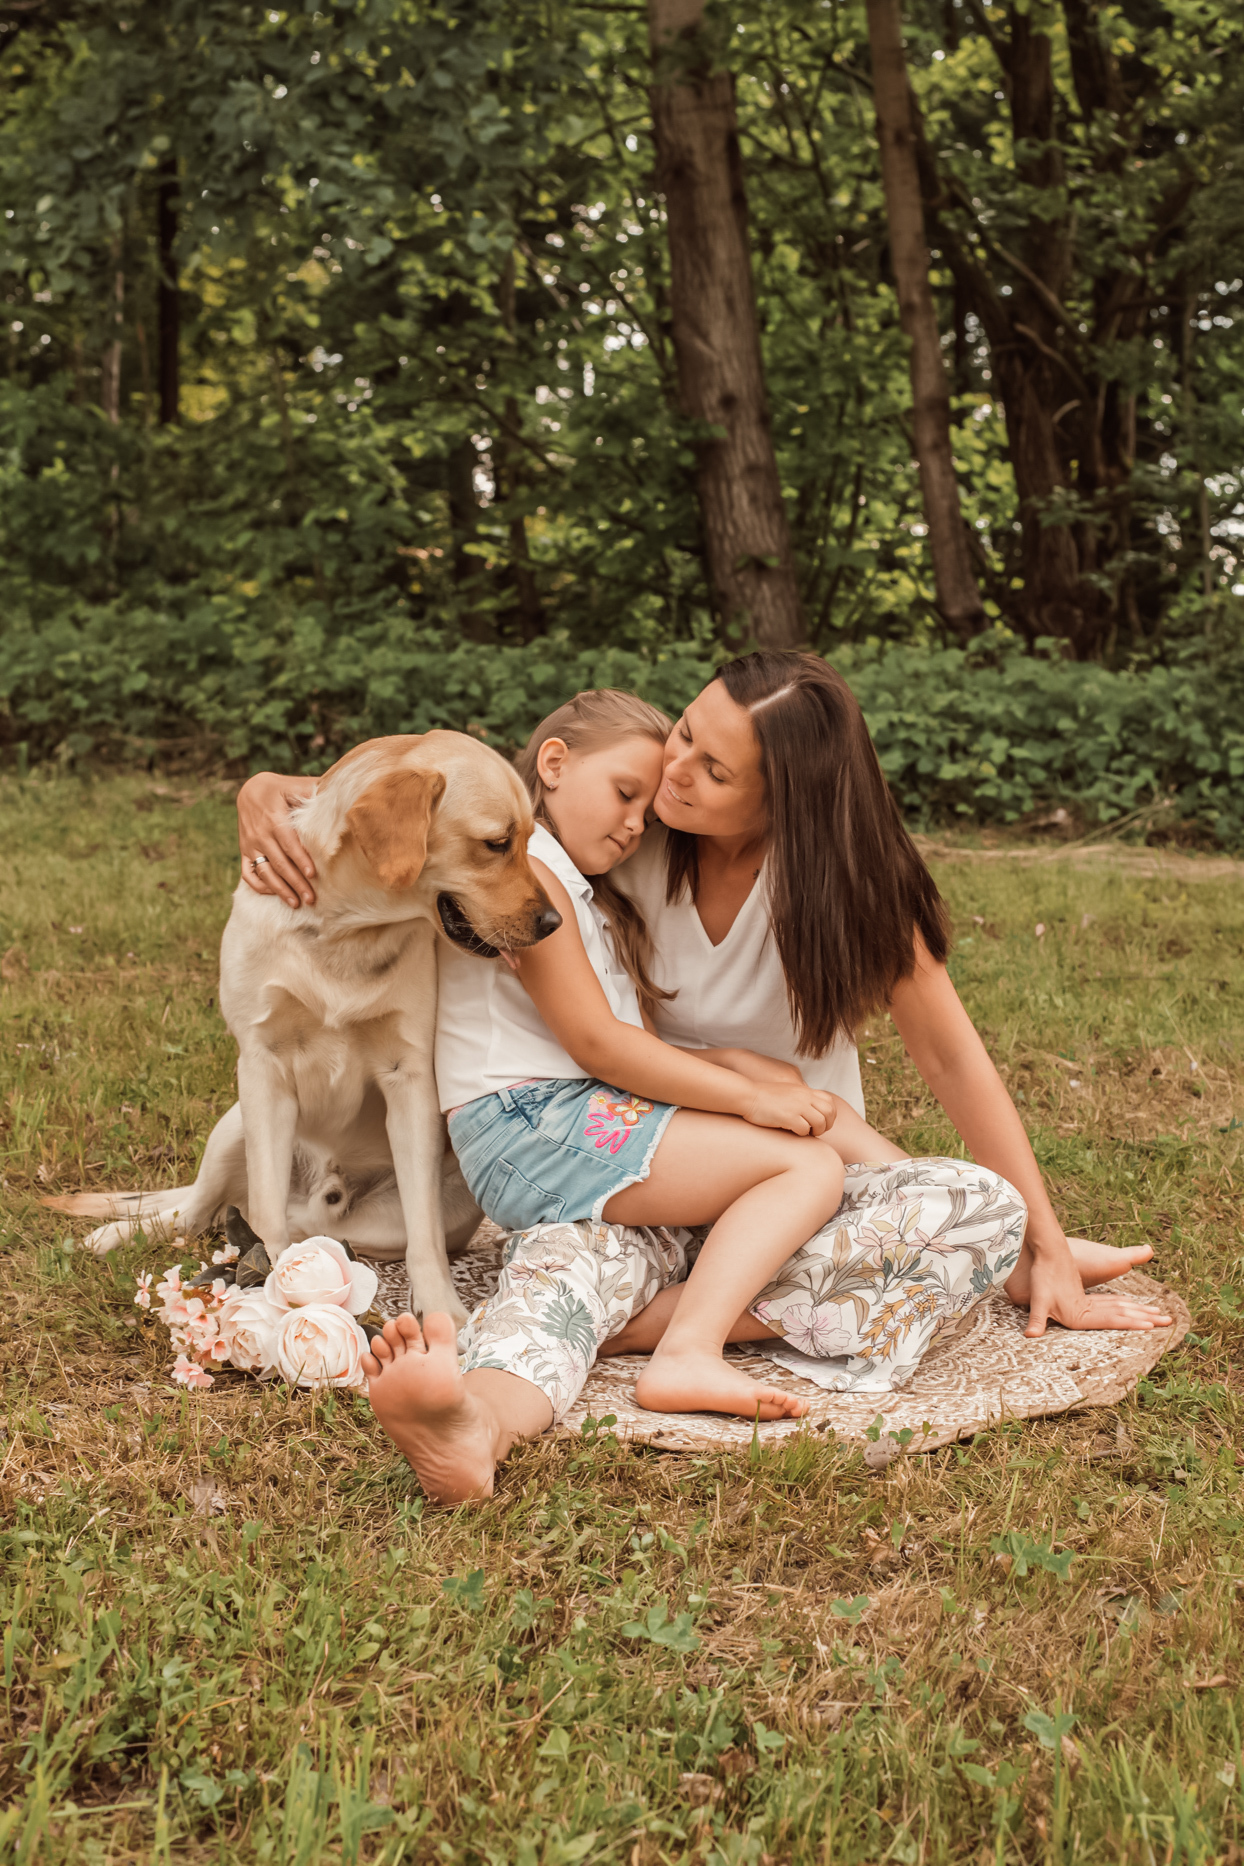 Familienshooting_Graber_web-56-1